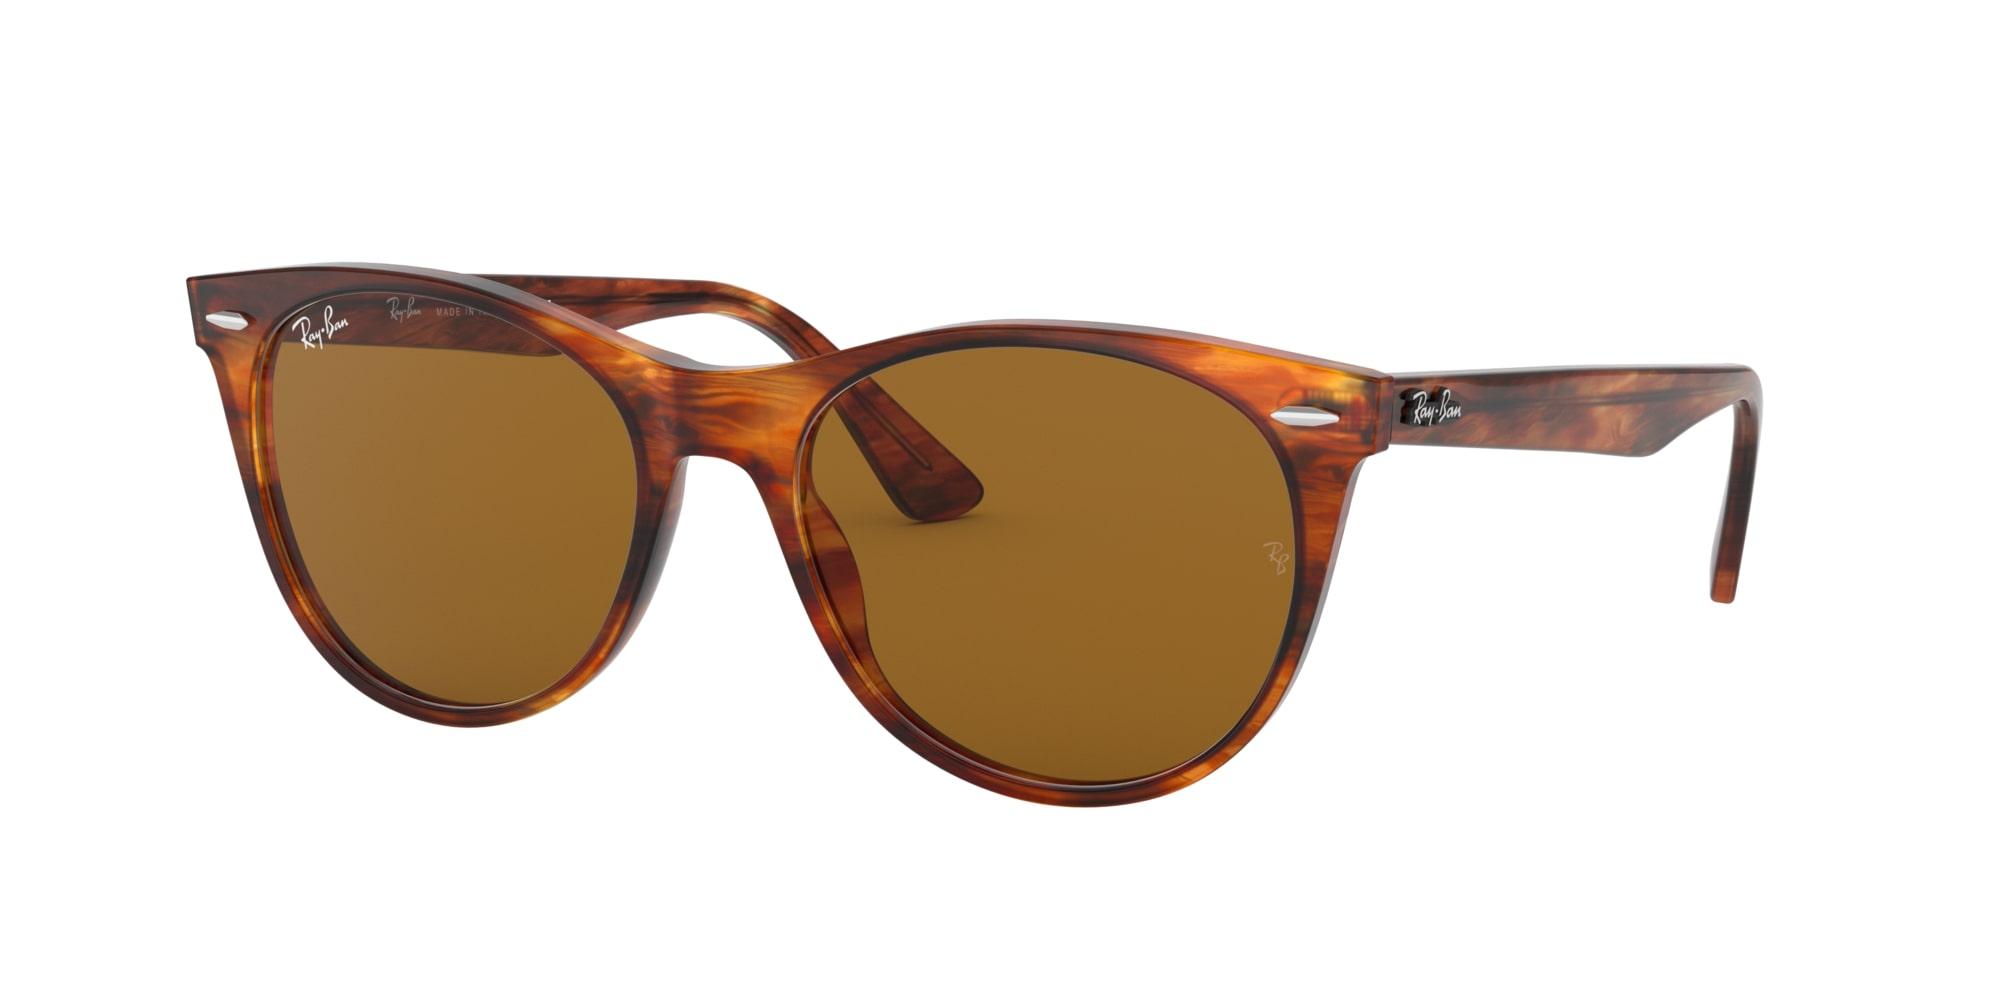 Ray Ban Wayfarer II Classic solbriller